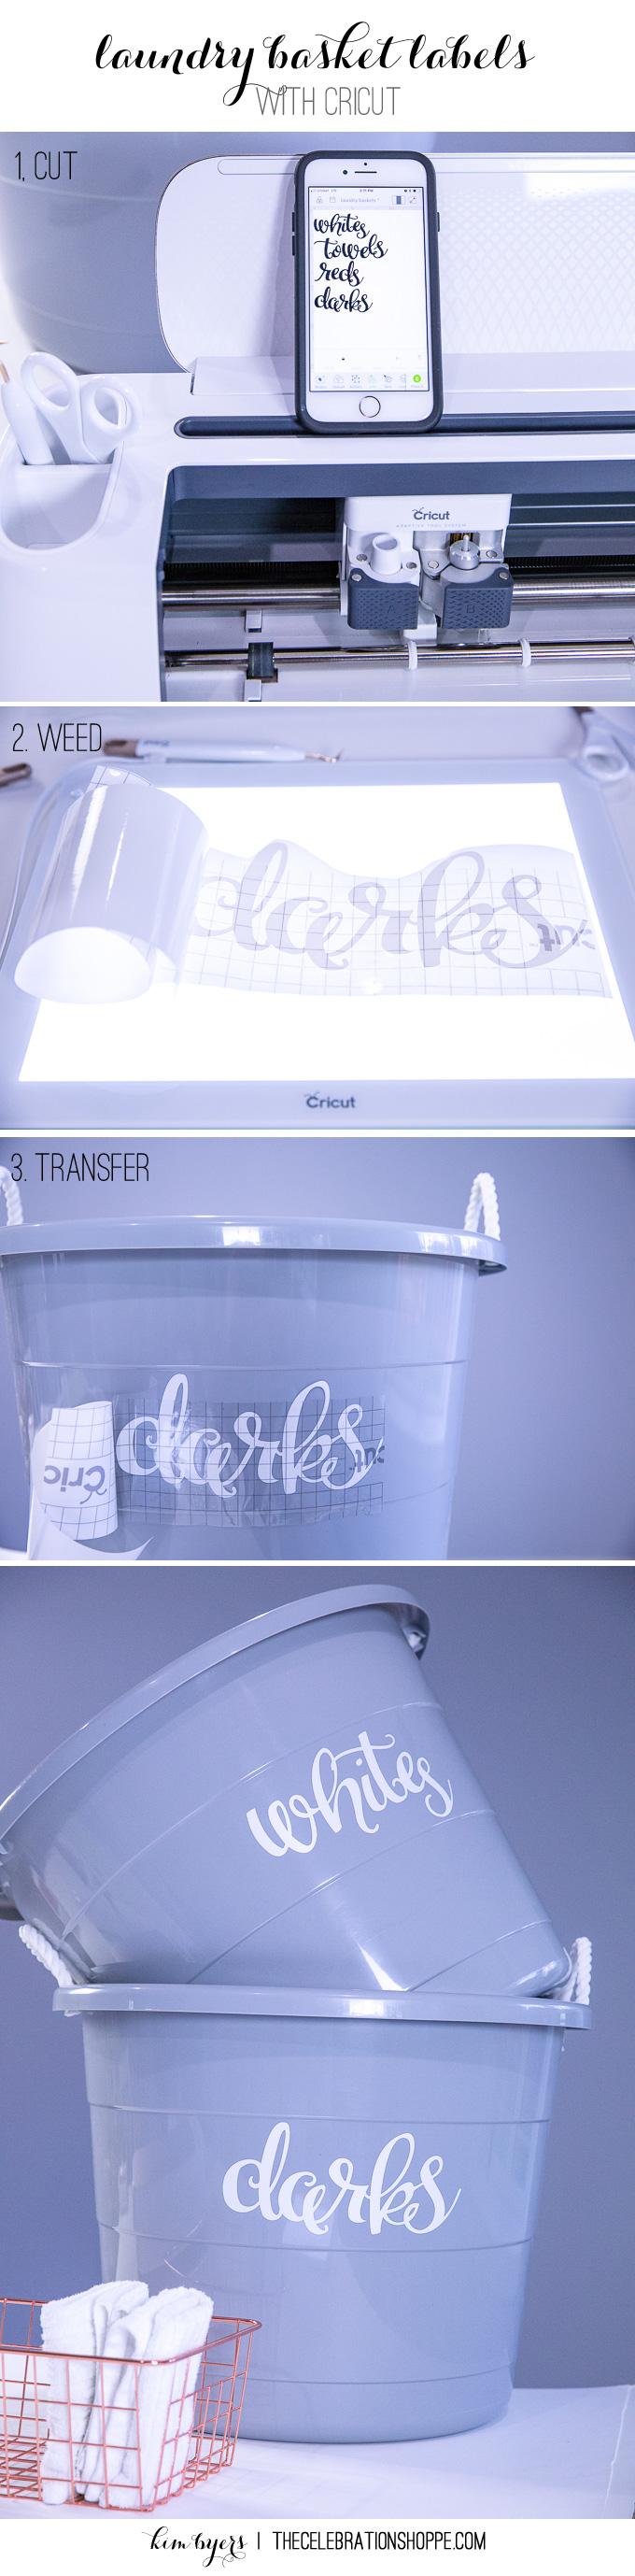 Make Laundry Basket Labels With Cricut | Kim Byers